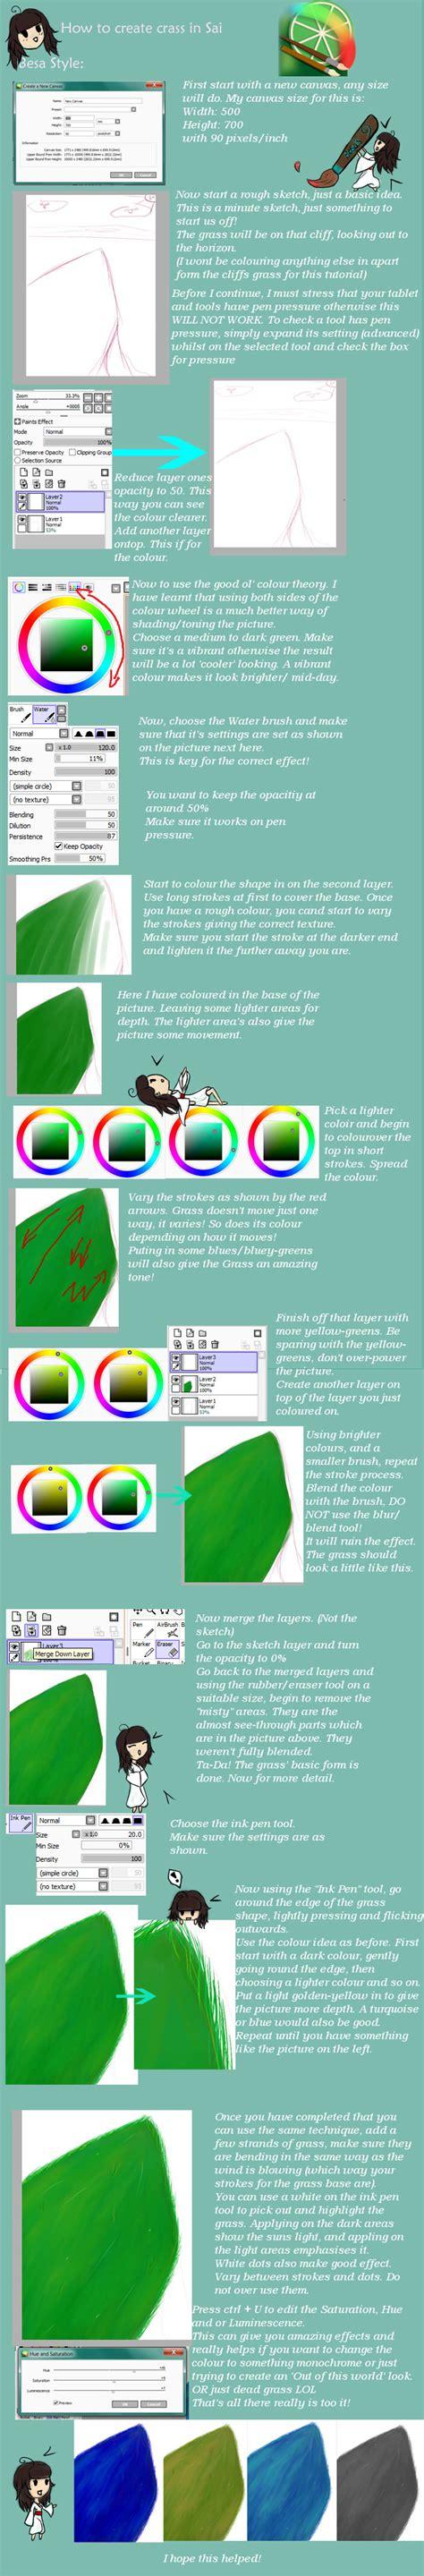 paint tool sai grass paint tool sai grass tutorial by besachan on deviantart